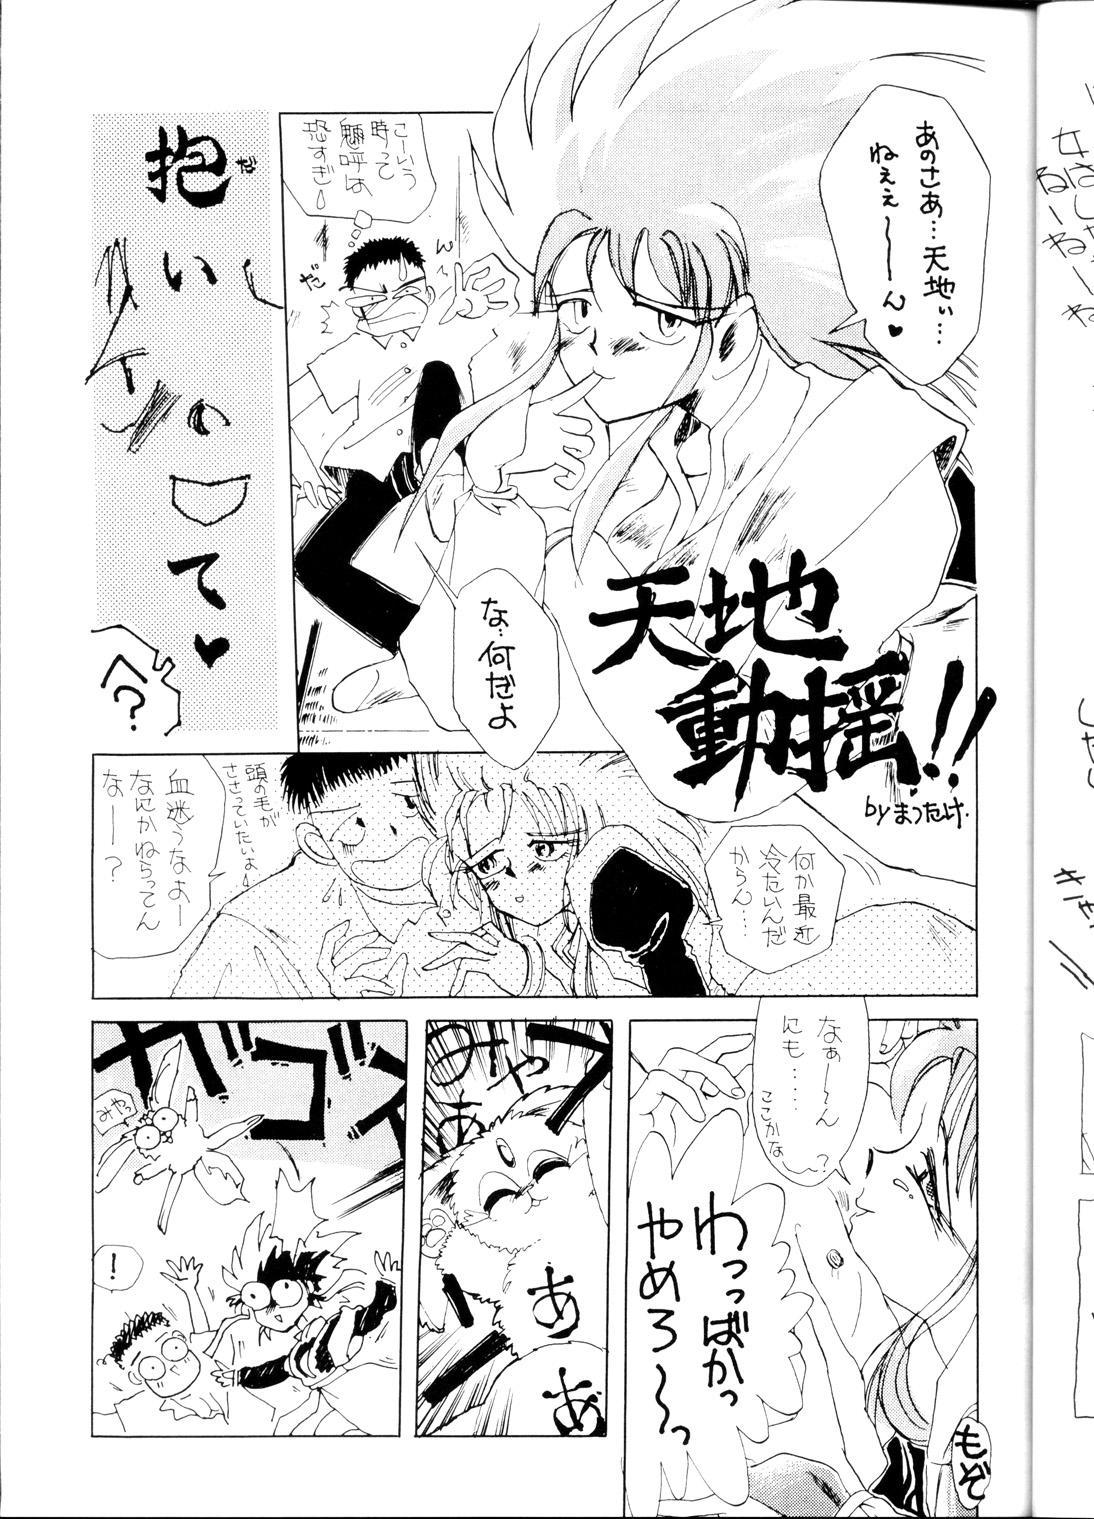 [B.B.C] Tenchi Muyou! Ryou-ou-ki Kaiteiben (Tenchi Muyou!) 17